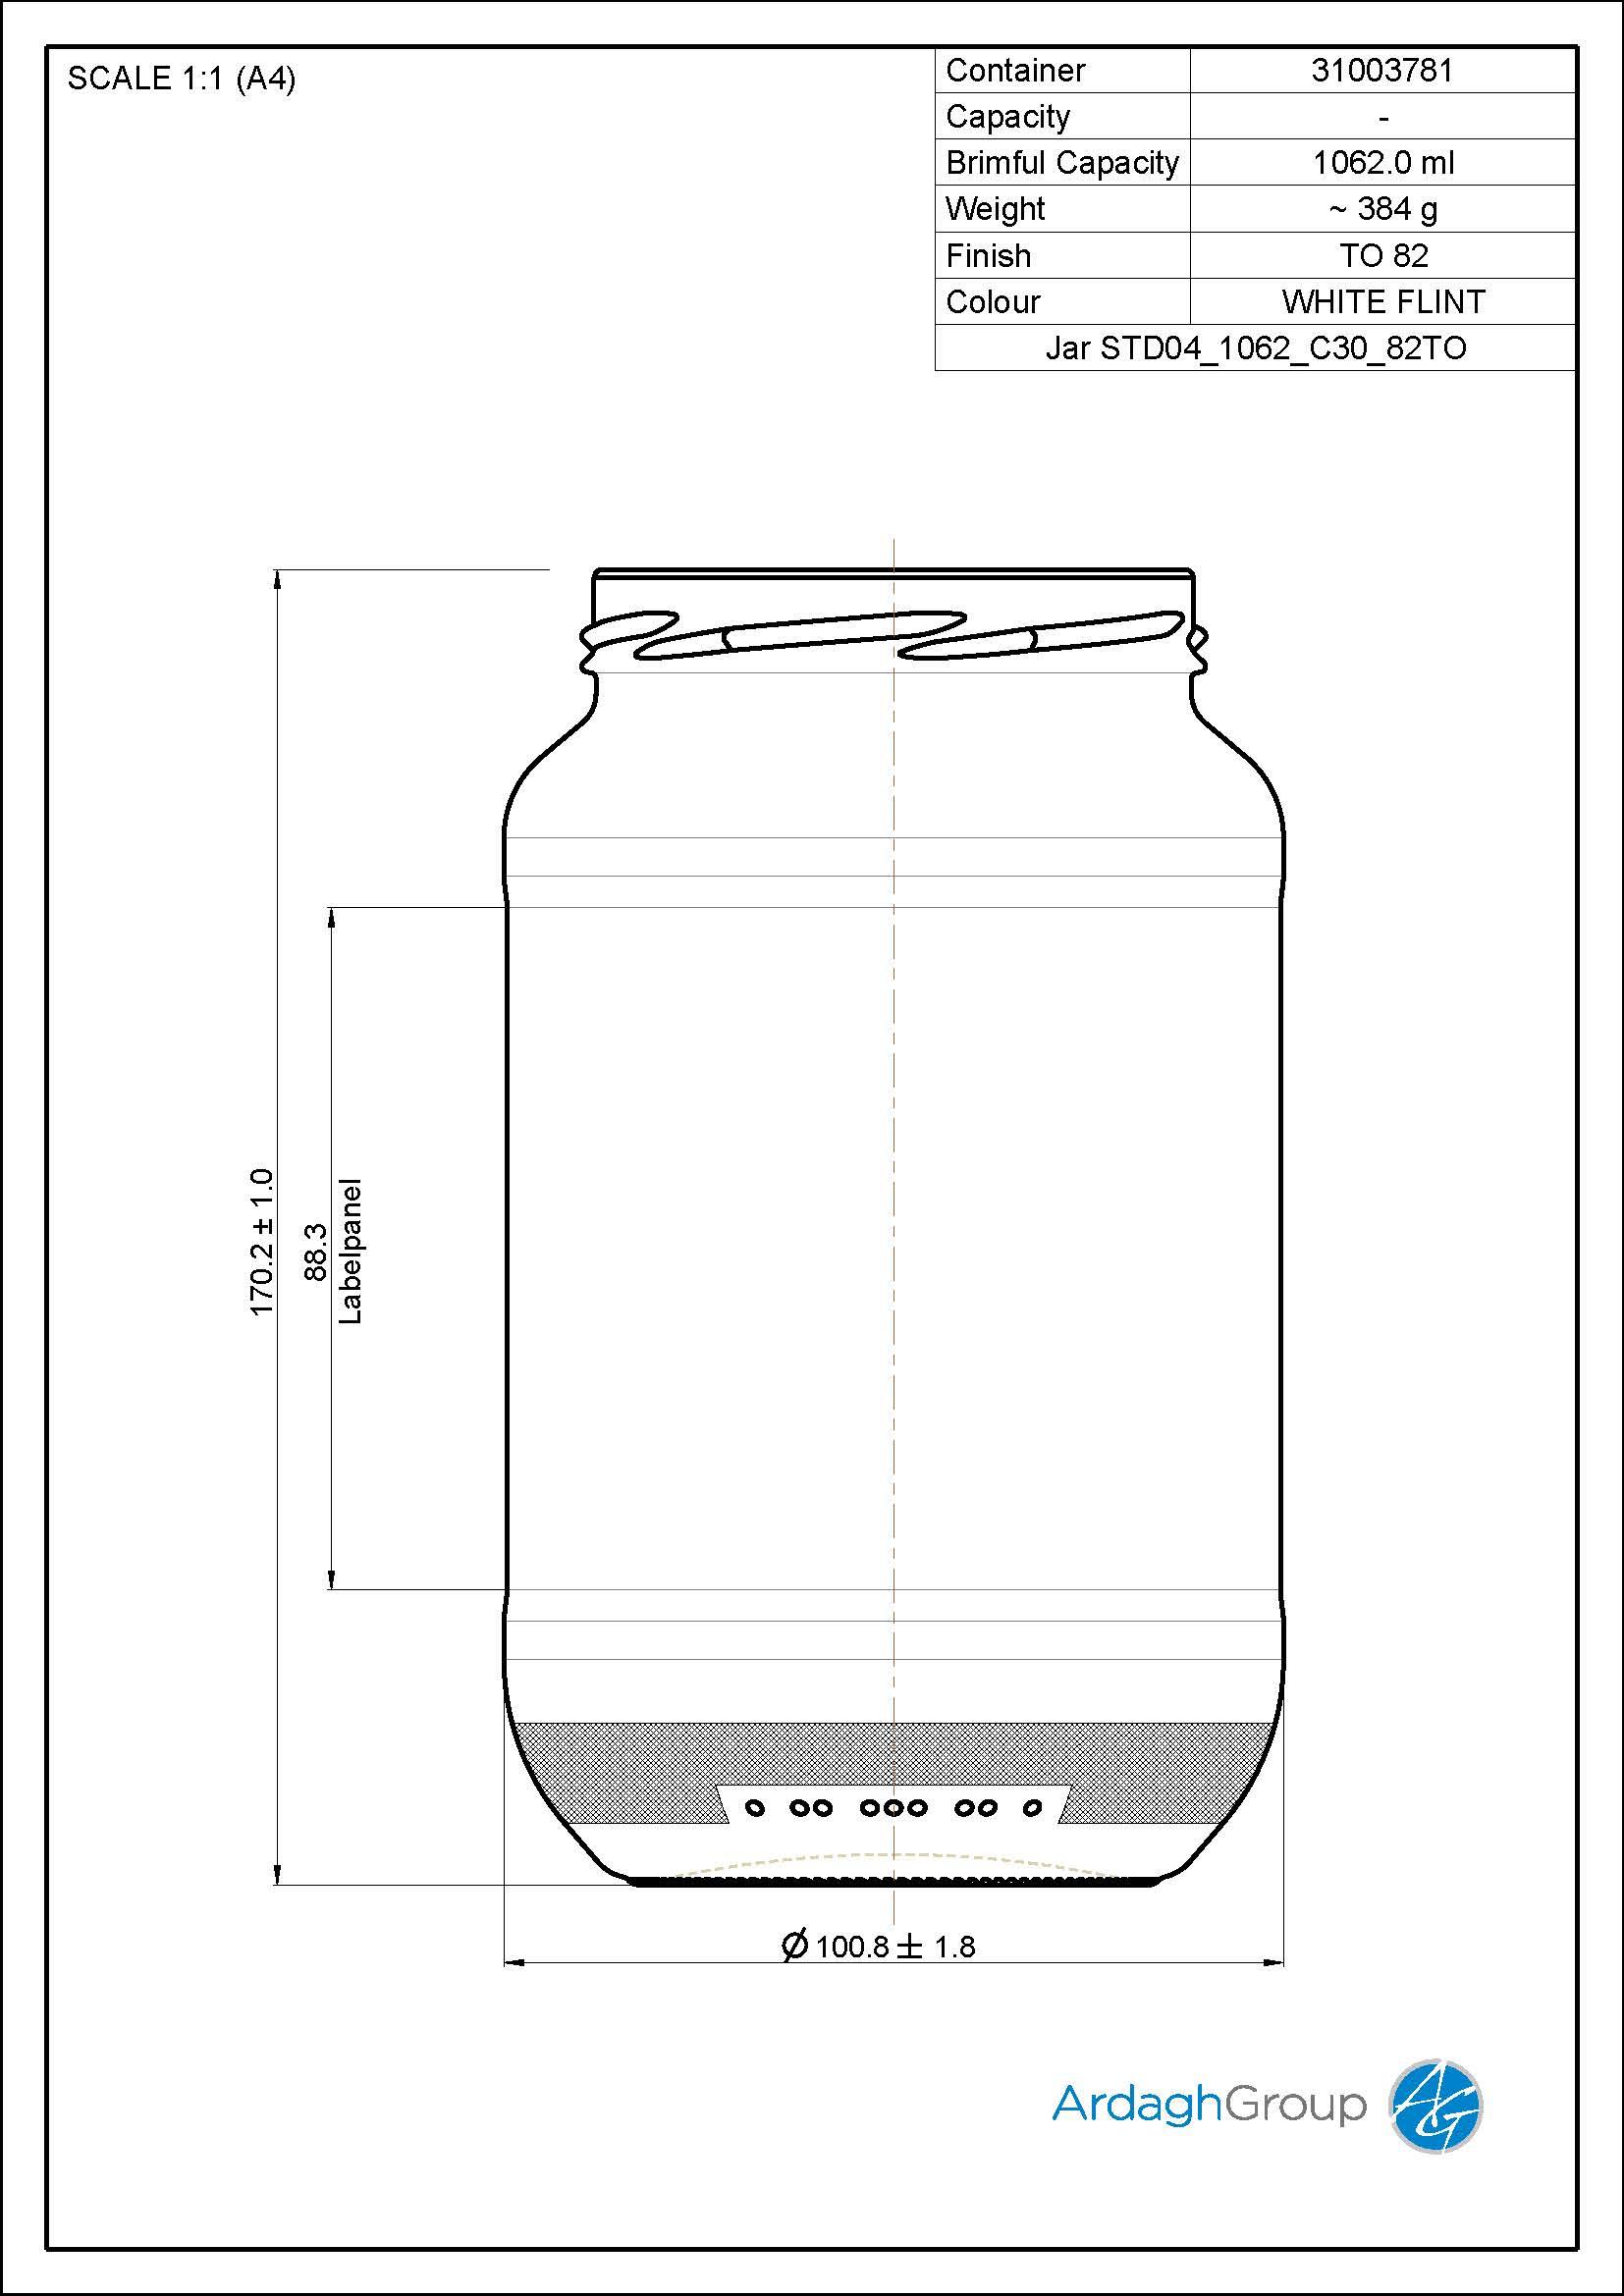 Jar STD04 1062 C30 82TO